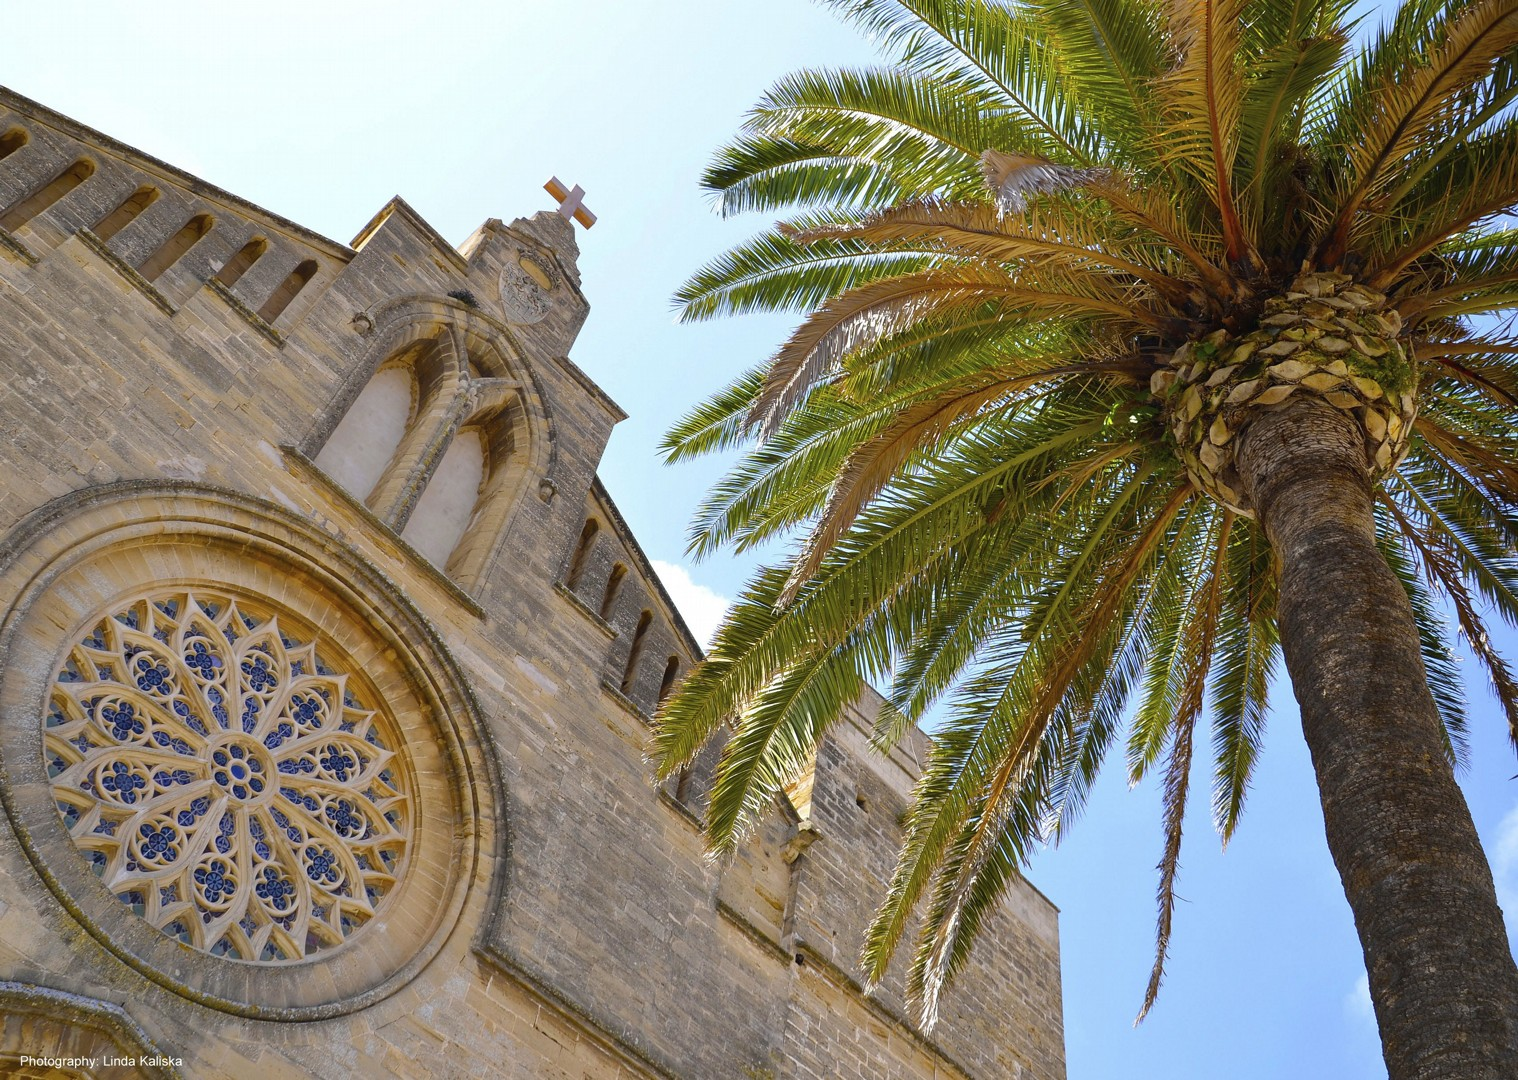 leisure-cycling-holiday-mallorca-history.jpg - Spain - Mallorca - Self-Guided Leisure Cycling Holiday - Leisure Cycling